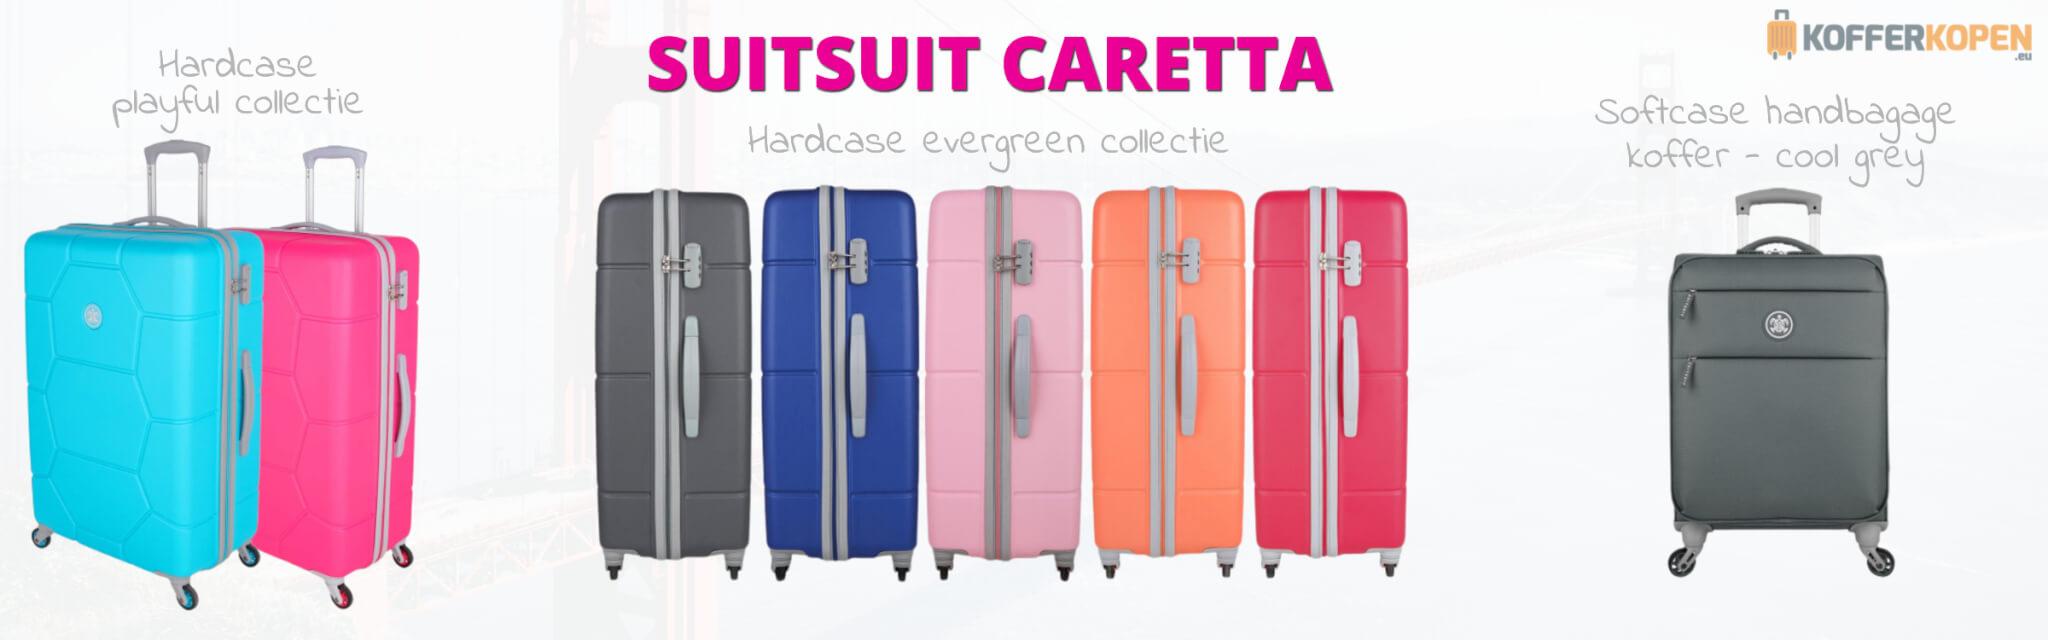 suitsuit caretta koffers kleuren hardcase softcase